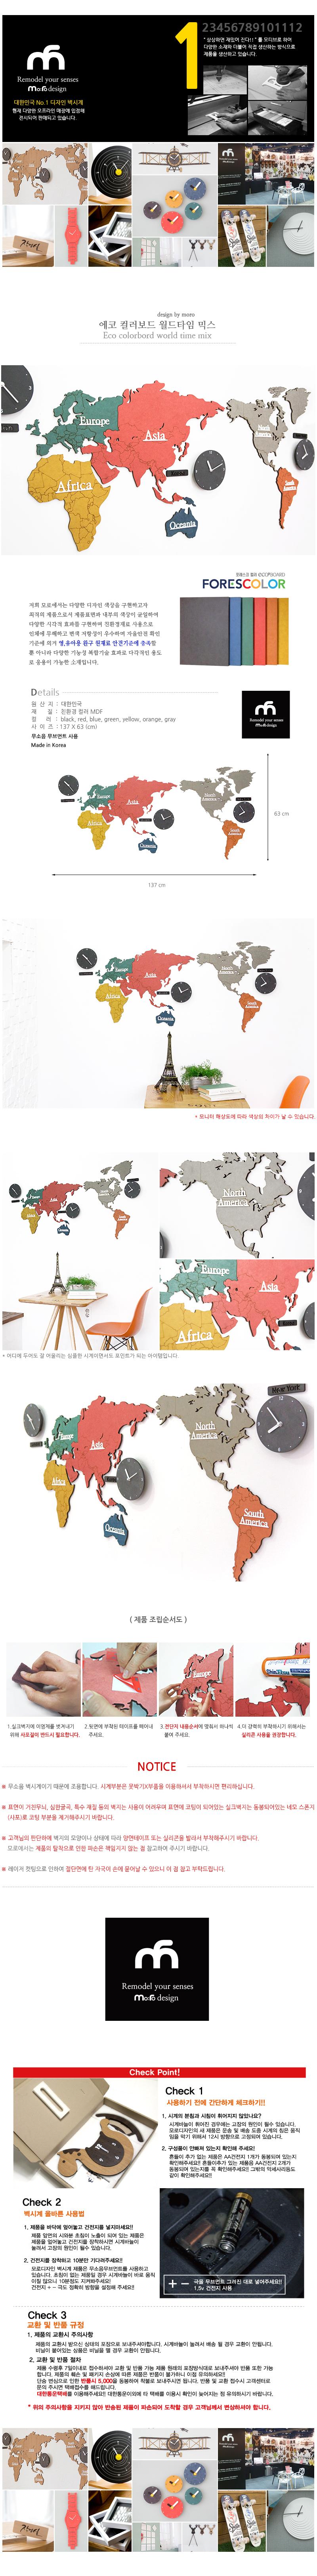 Eco mix 컬러보드 월드타임 - 모로, 71,400원, 벽시계, 디자인벽시계